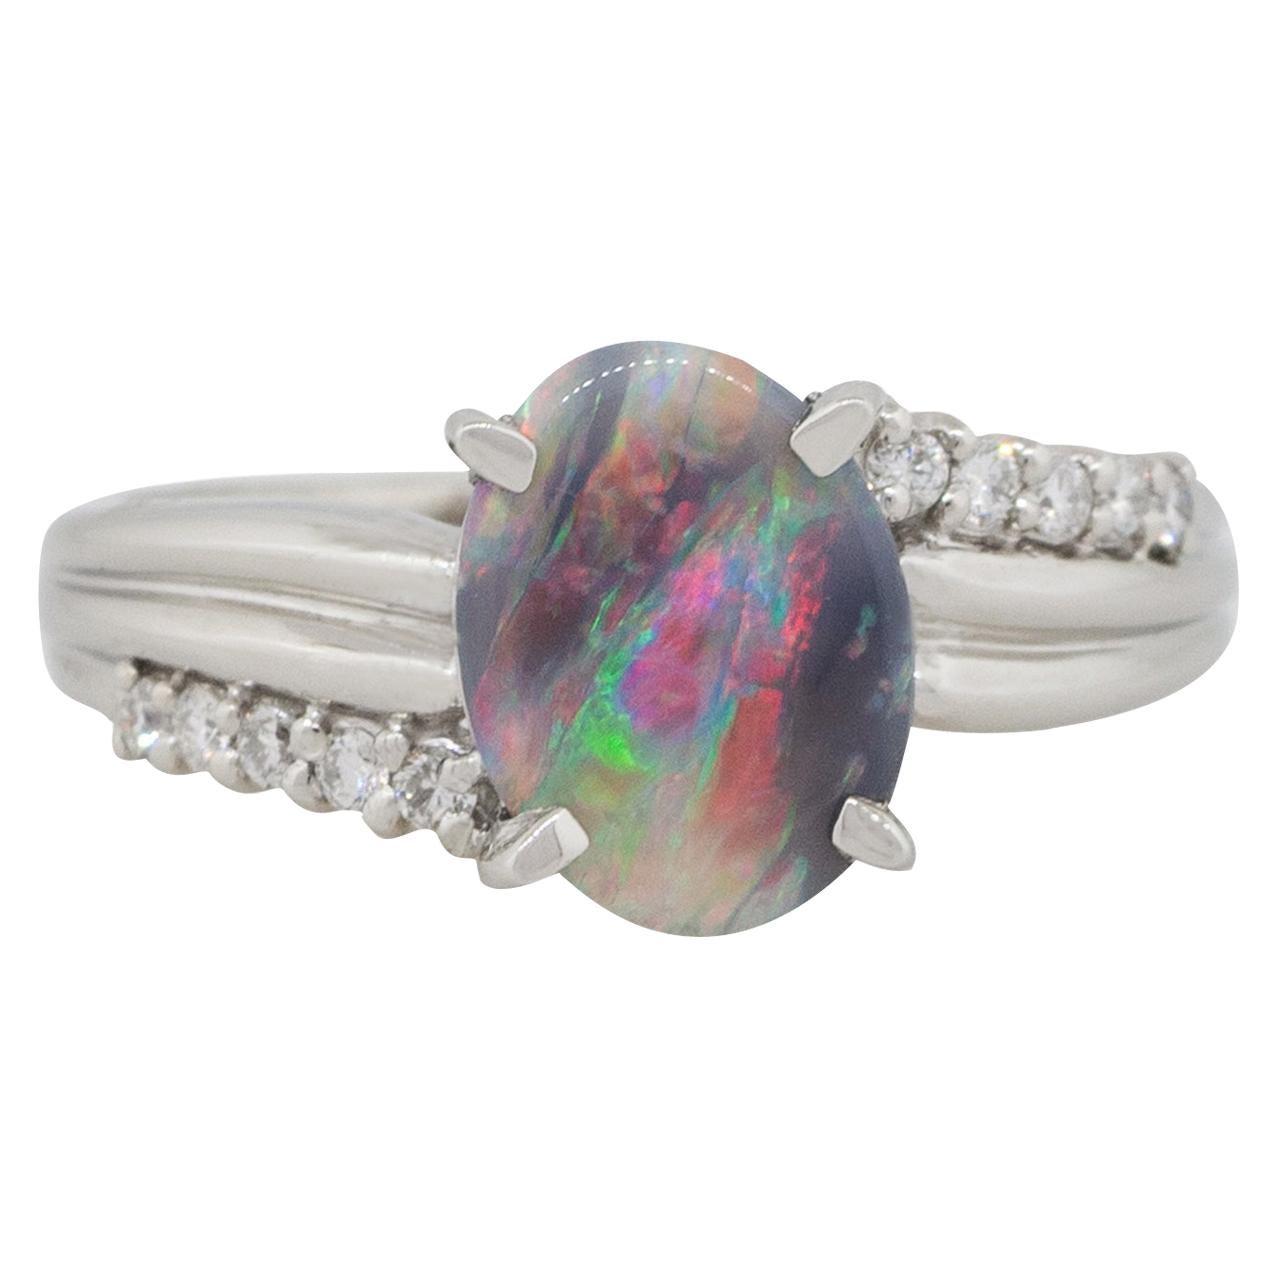 Platinum 0.16 Carat Diamond Black Oval Opal Cocktail Ring